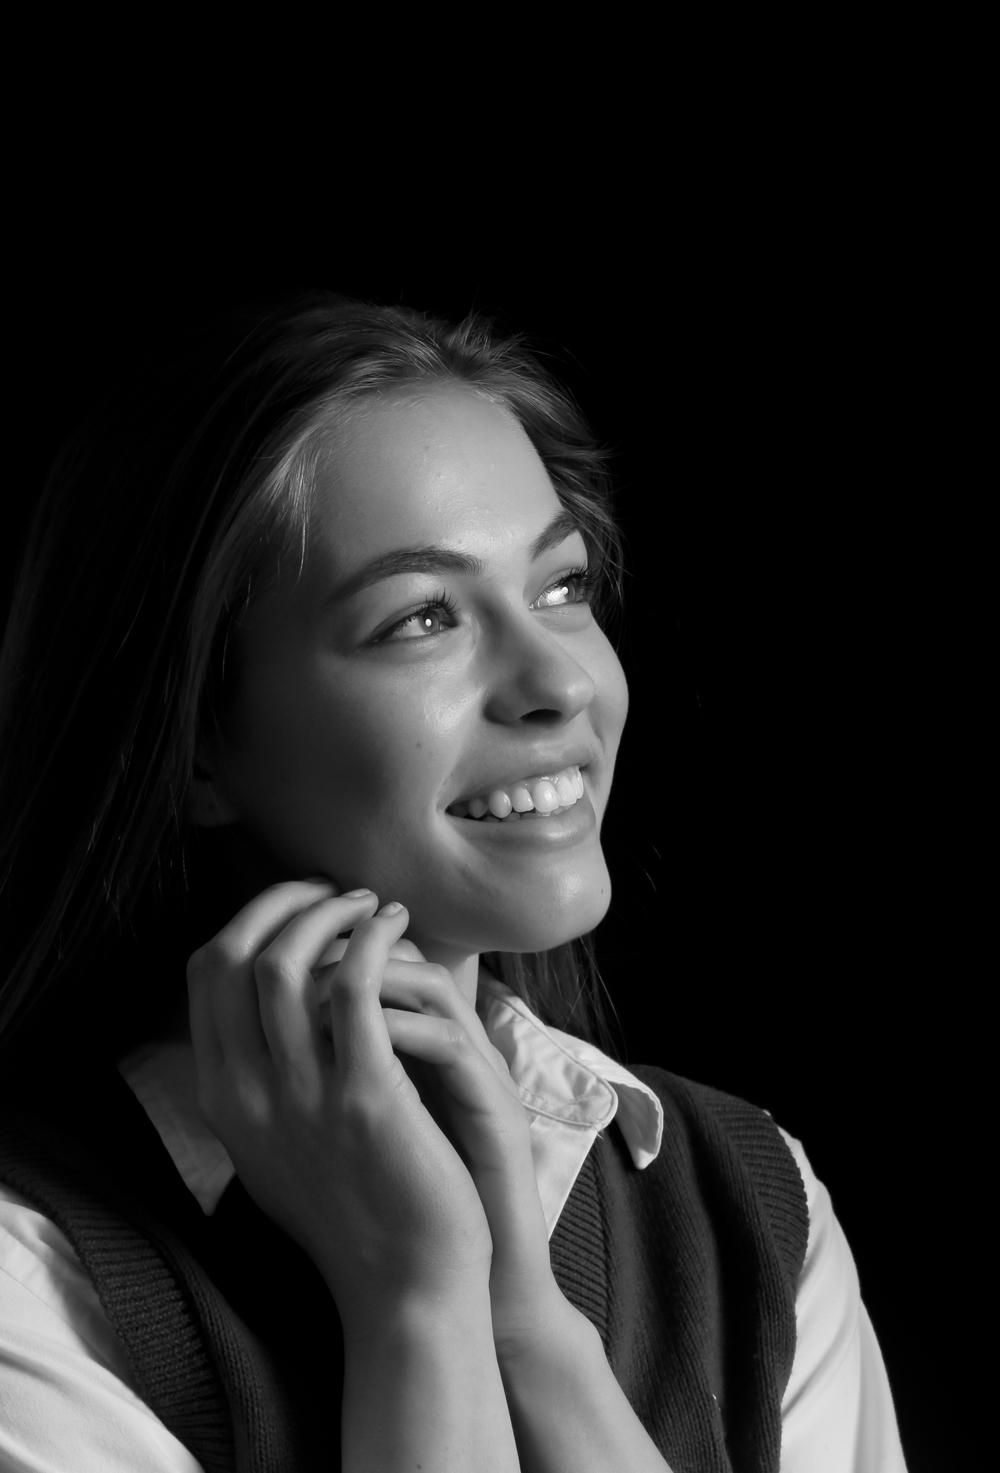 BGHS Student Caroline Kelley